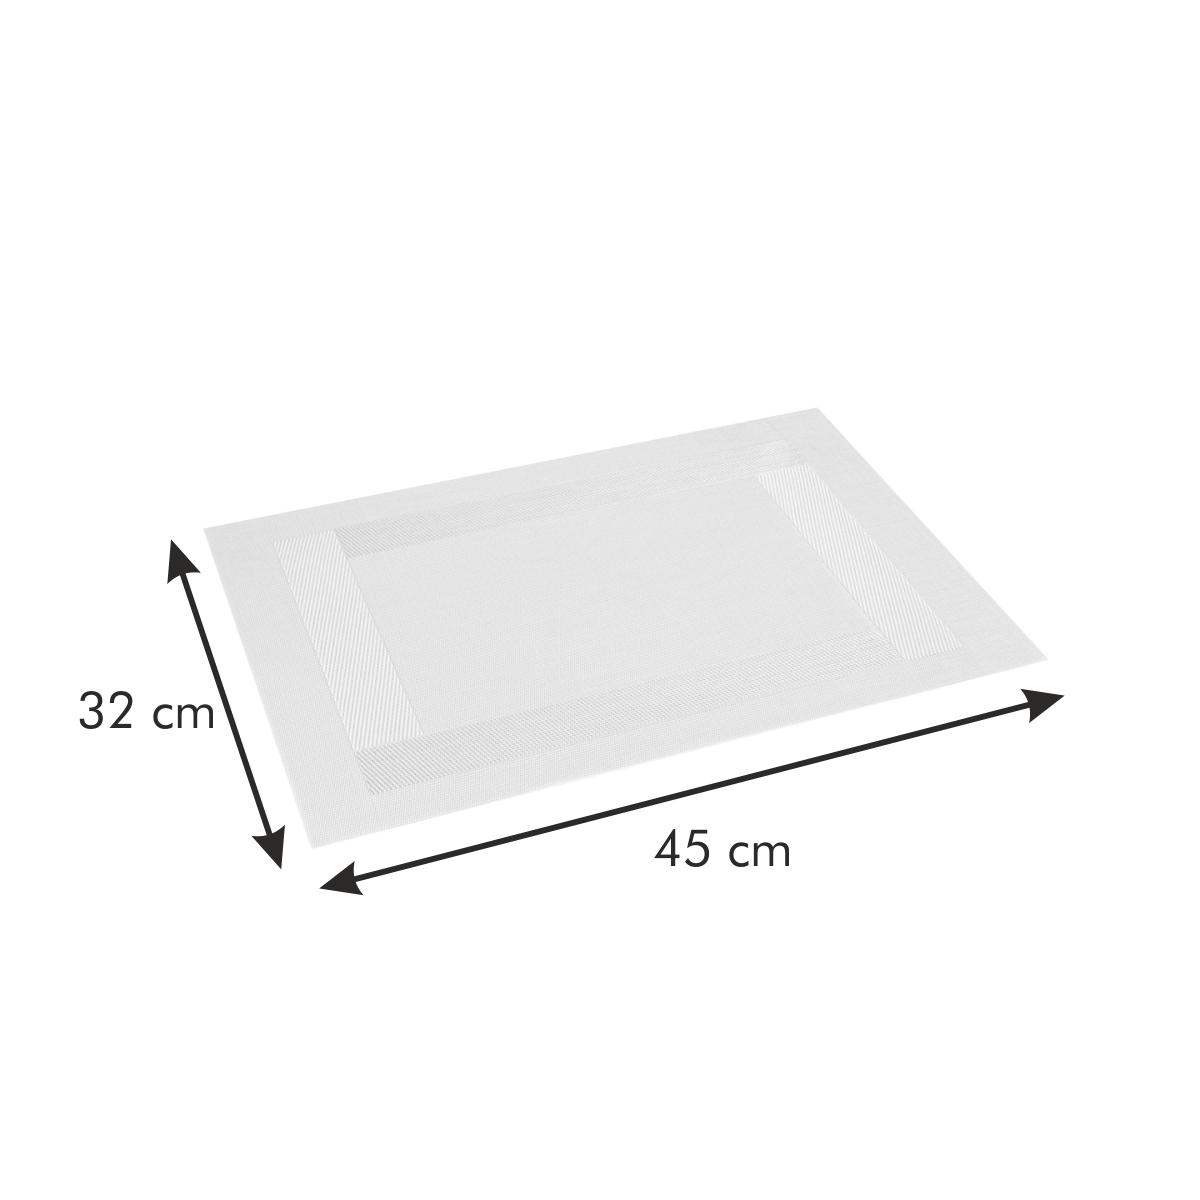 Prostírání FLAIR FRAME 45x32 cm, smetanová